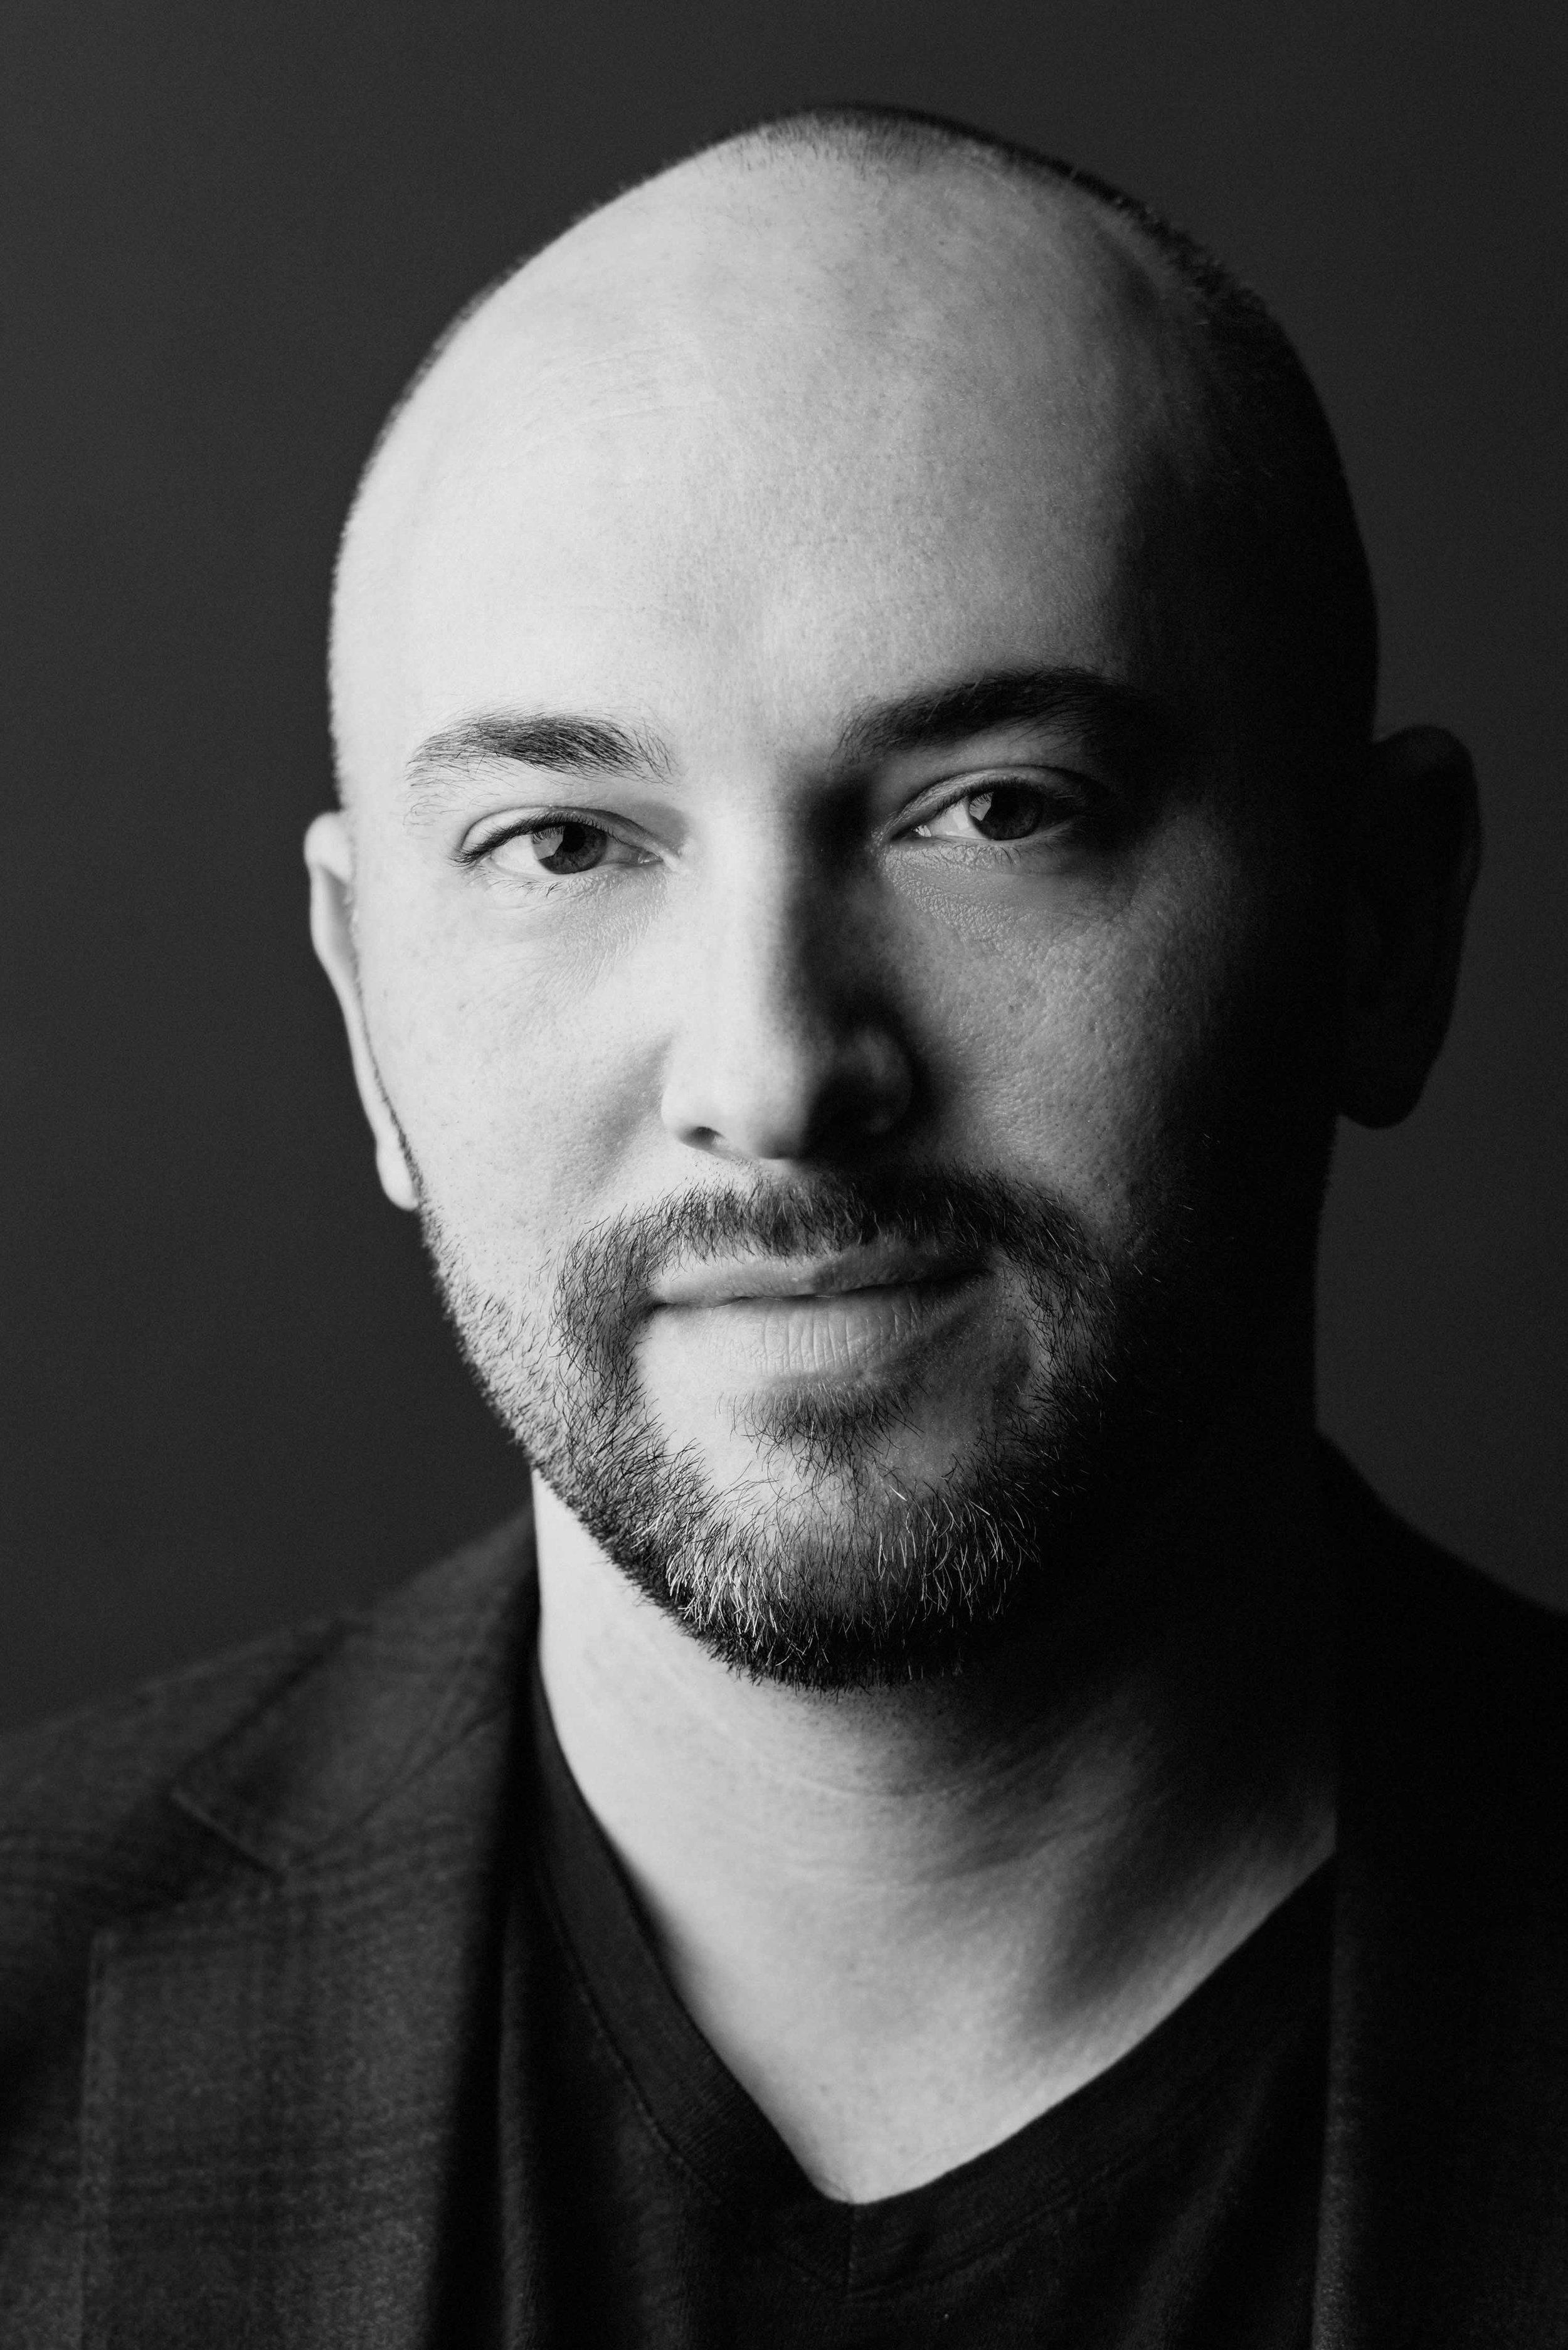 Ryan Born - Chief Executive Officer